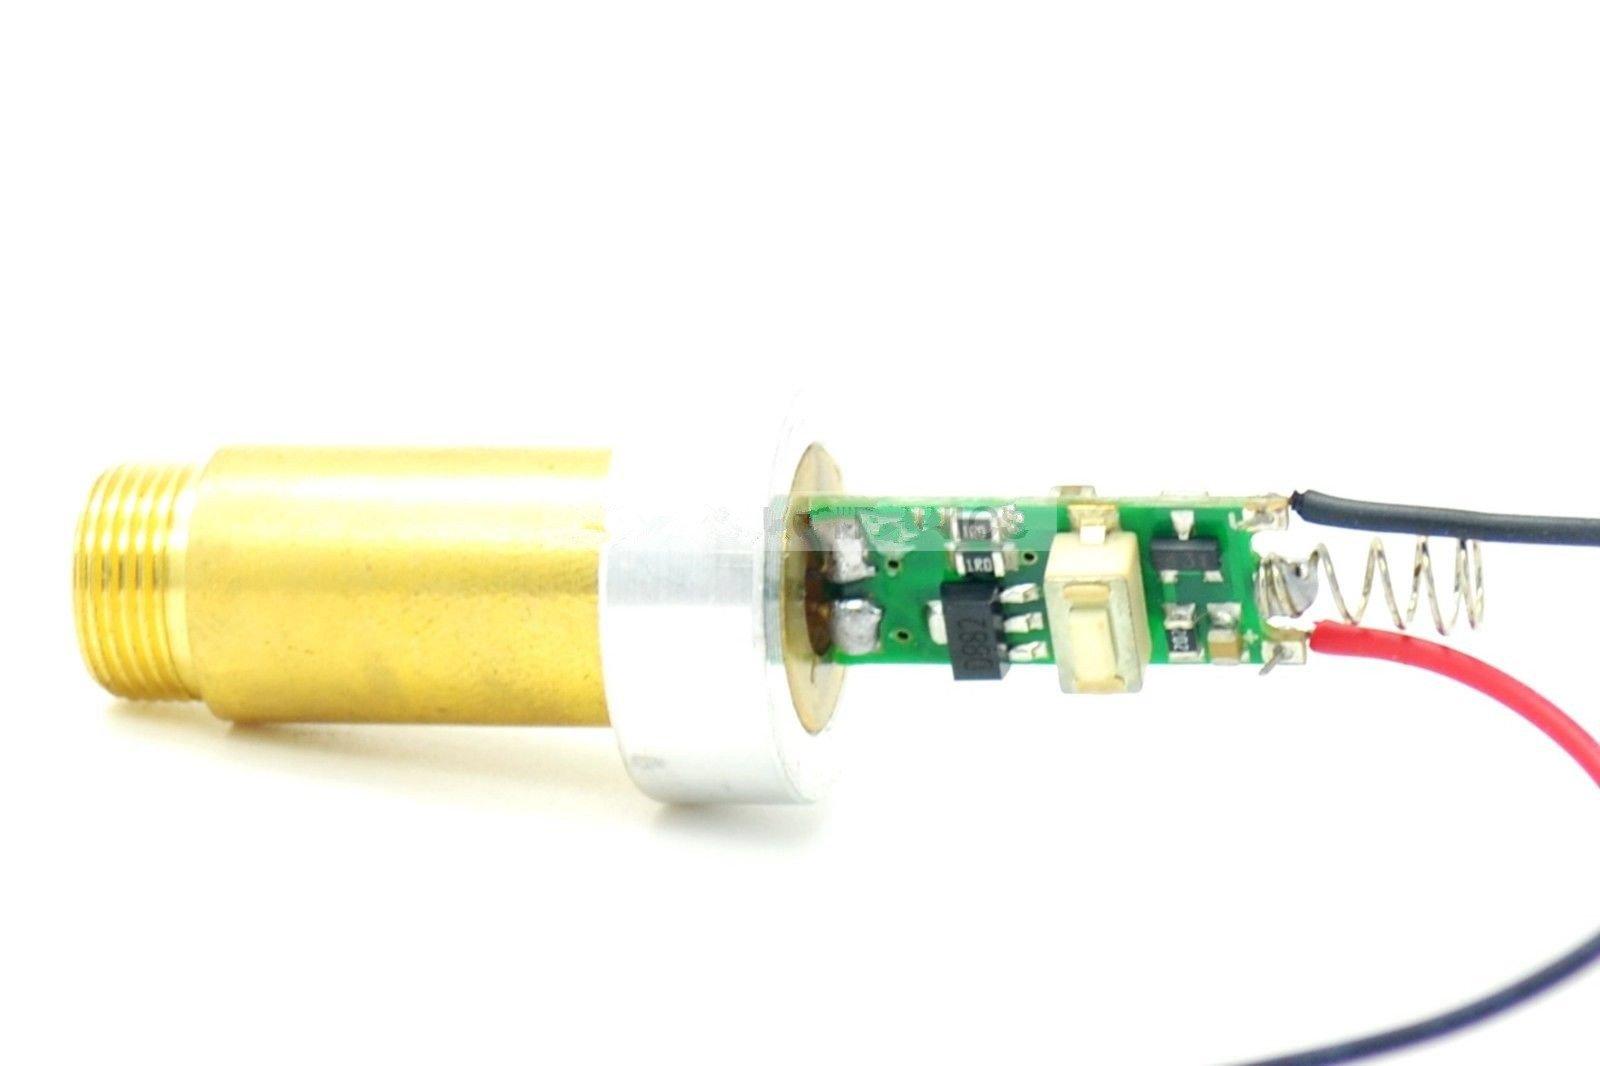 532nm 200mW Green Laser Diode Module 3.7v-4.2v w/ Heatsink by sunshine-electronics (Image #3)